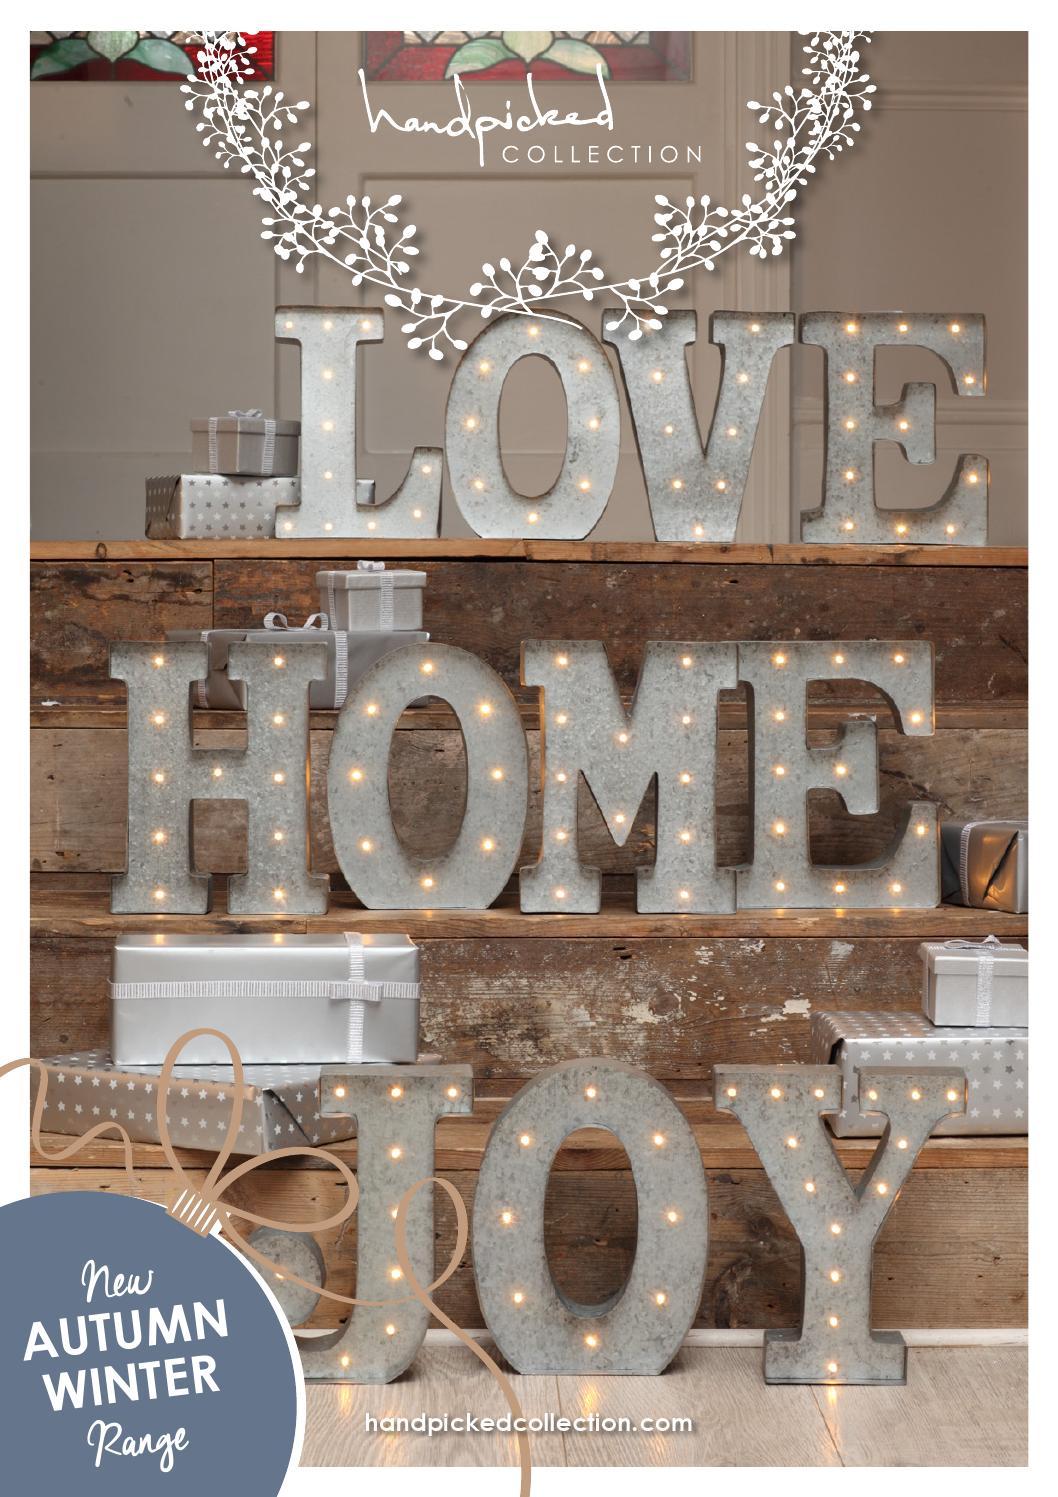 Paris Sampler Stone Coasters Set Of 4 With Script Lettering Handstamped Designer Stone Home Decor Gift For Her